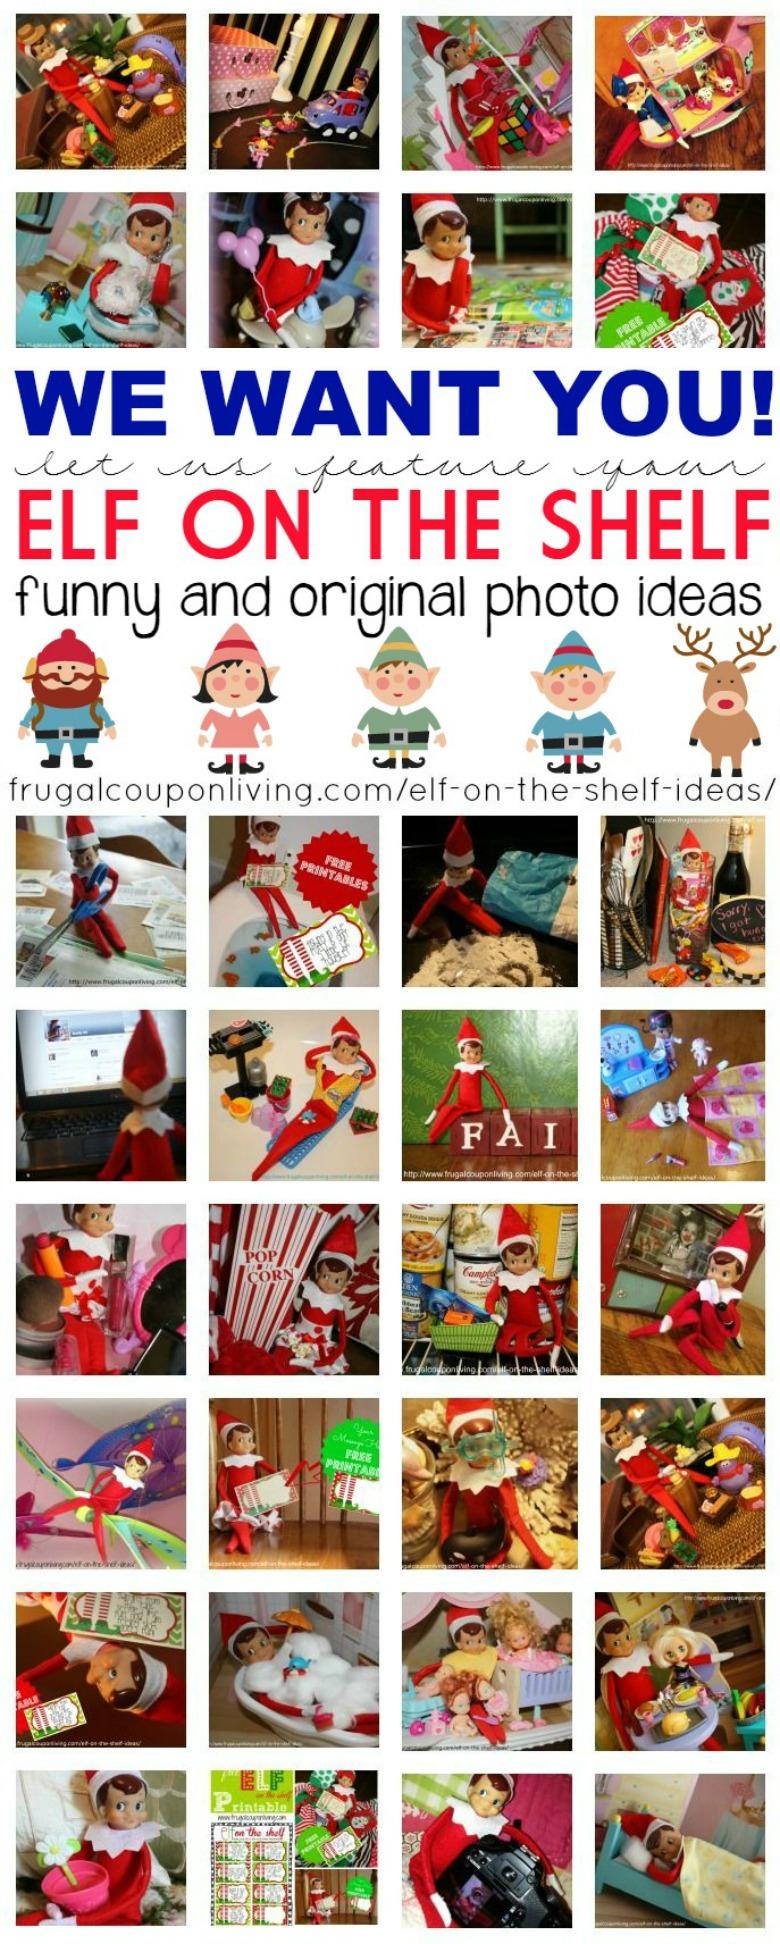 we-want-you-dozens-of-elf-on-the-shelf-ideas